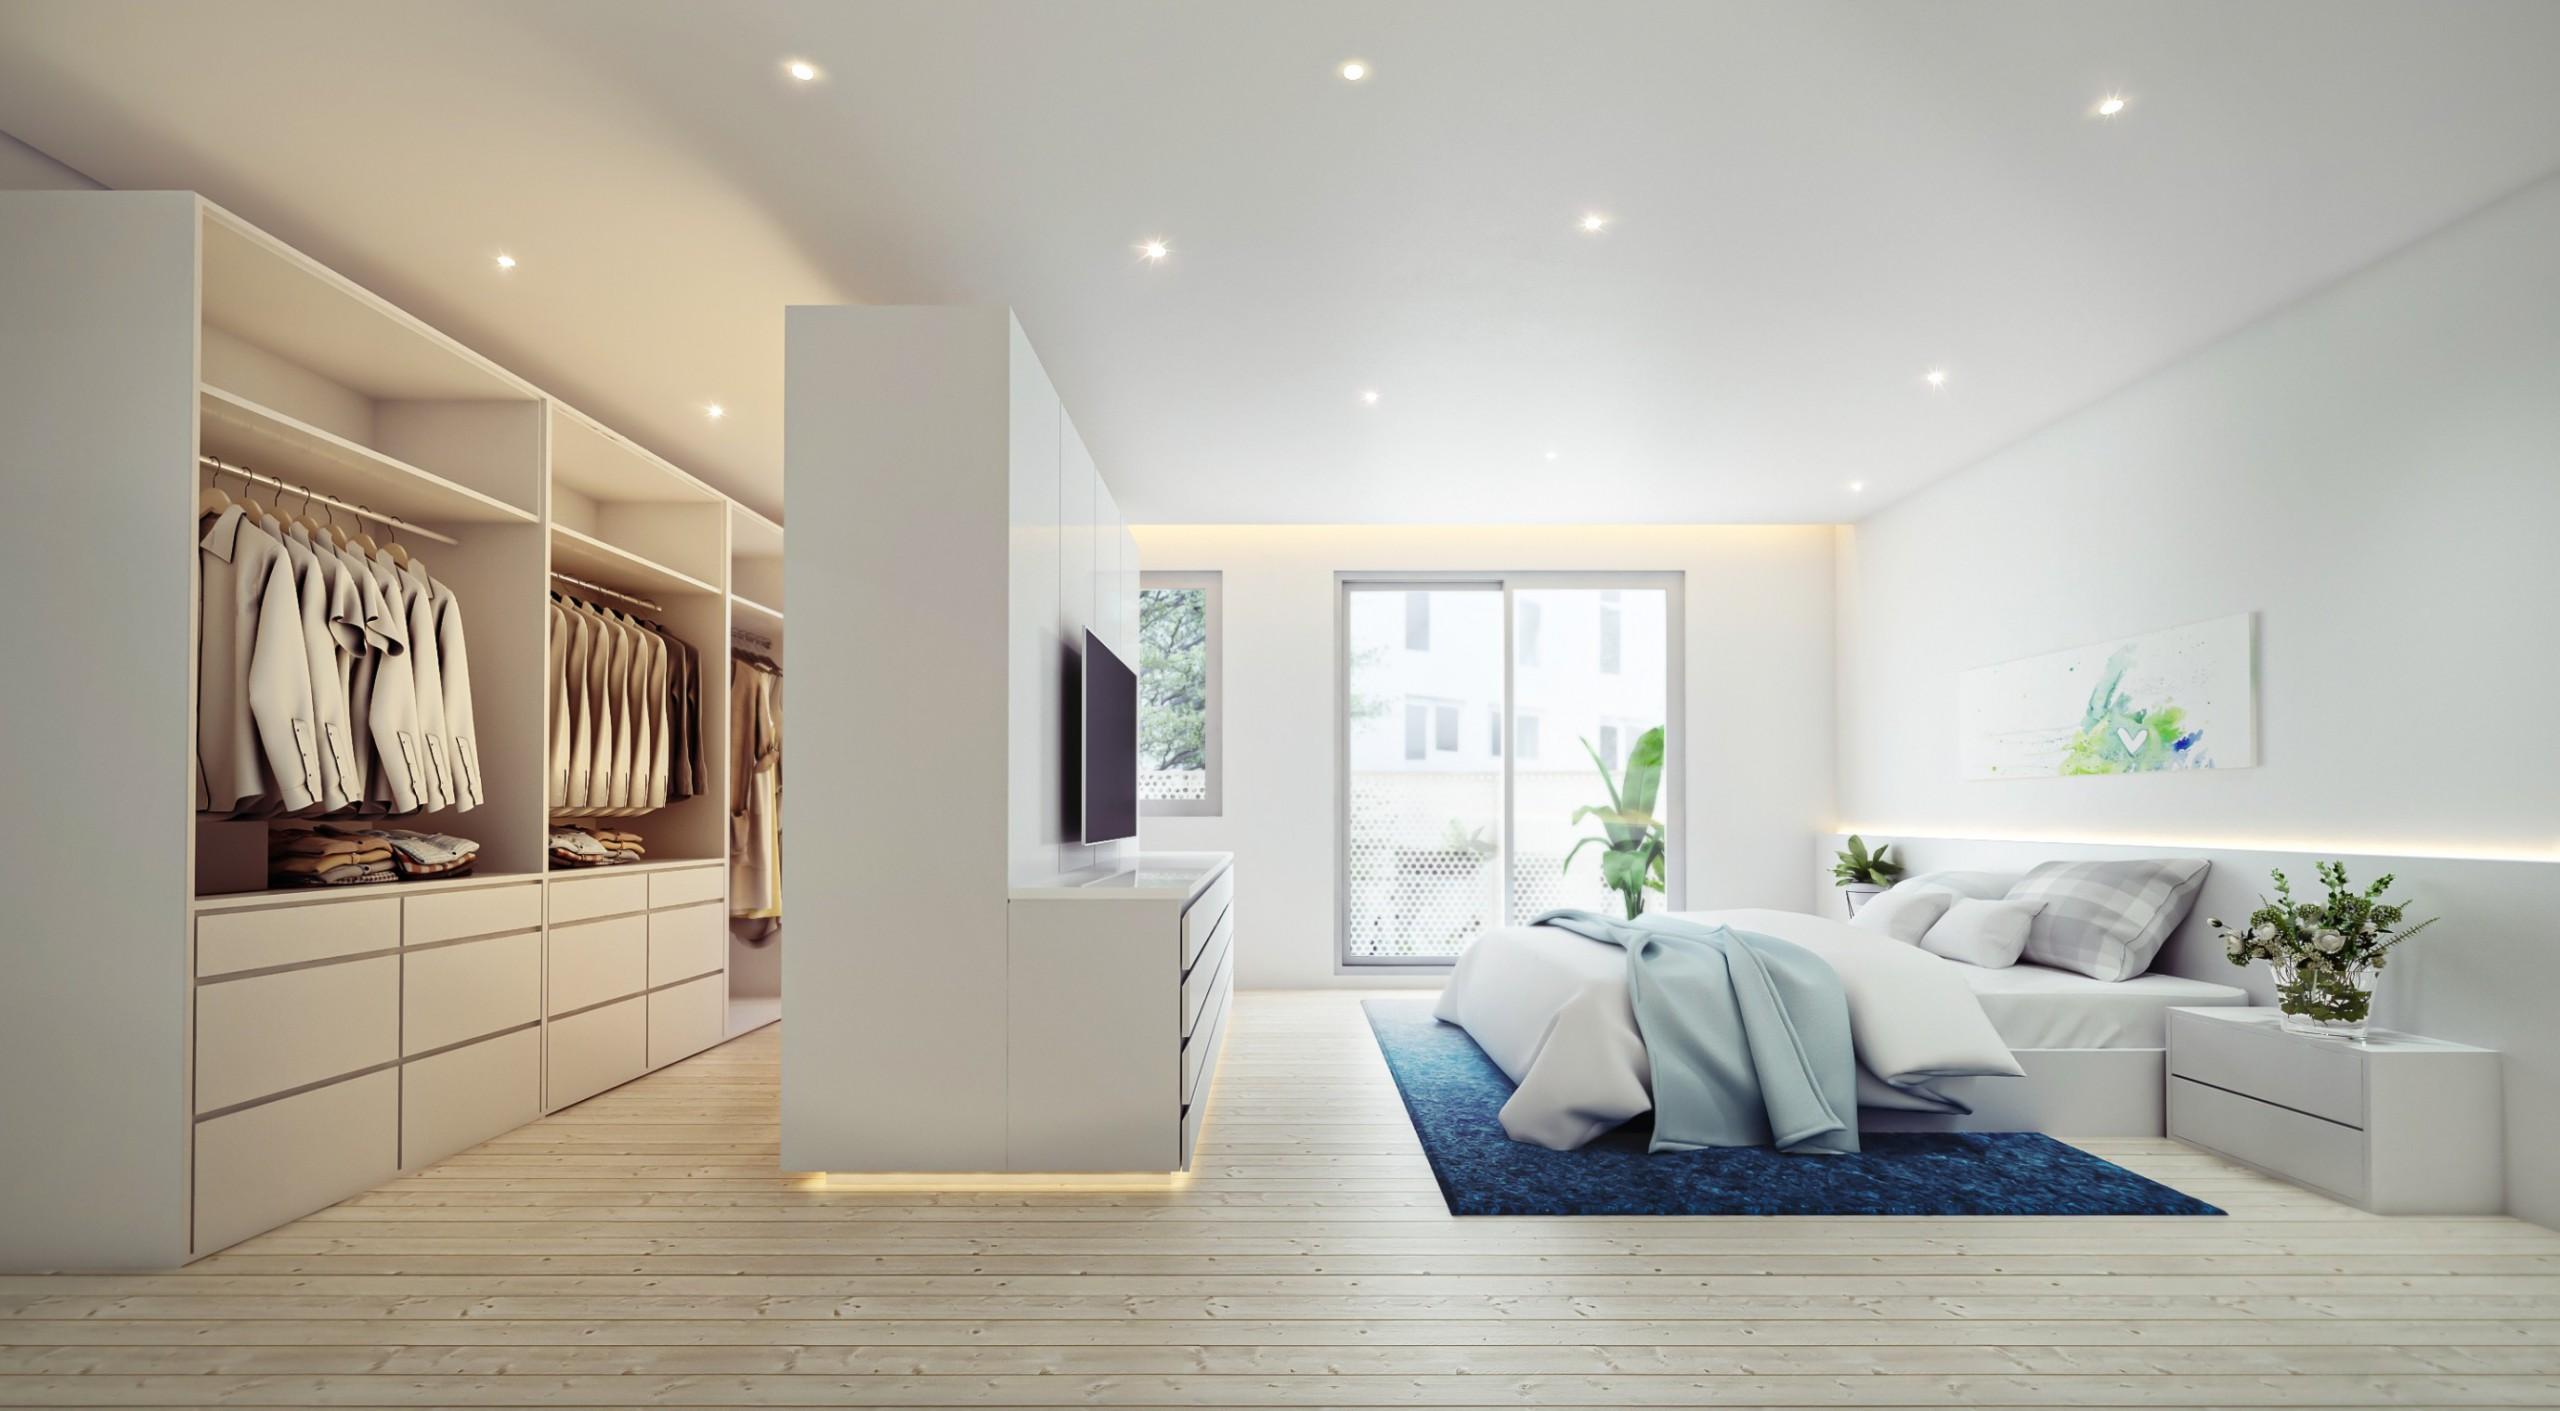 德築-DEZU-project-Zuxing-architecture-build-rendering-4